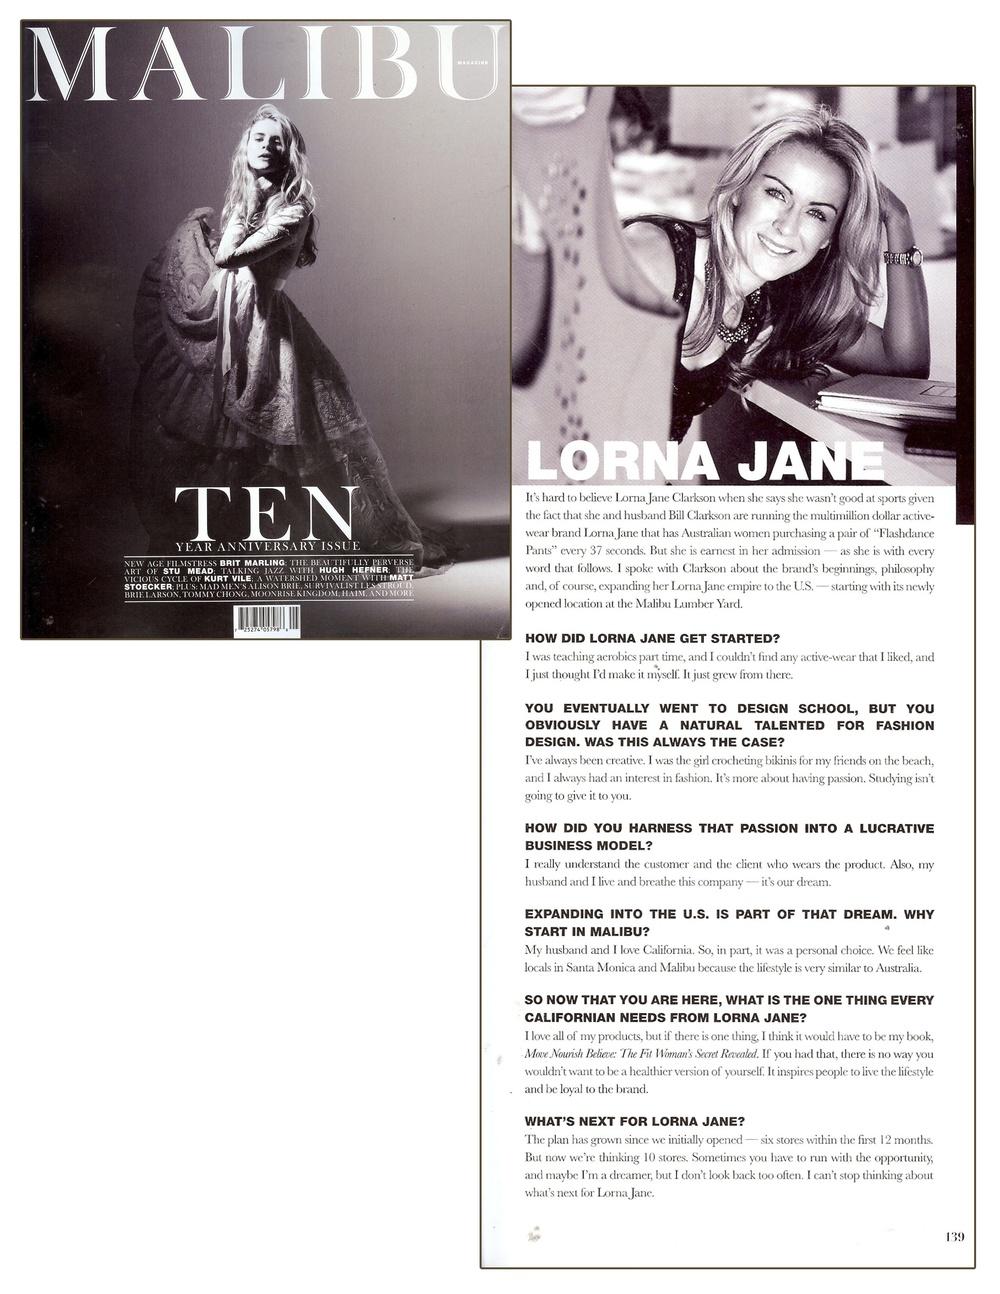 AprilMay 2012 - Malibu Magazine - Lorna Jane.jpg